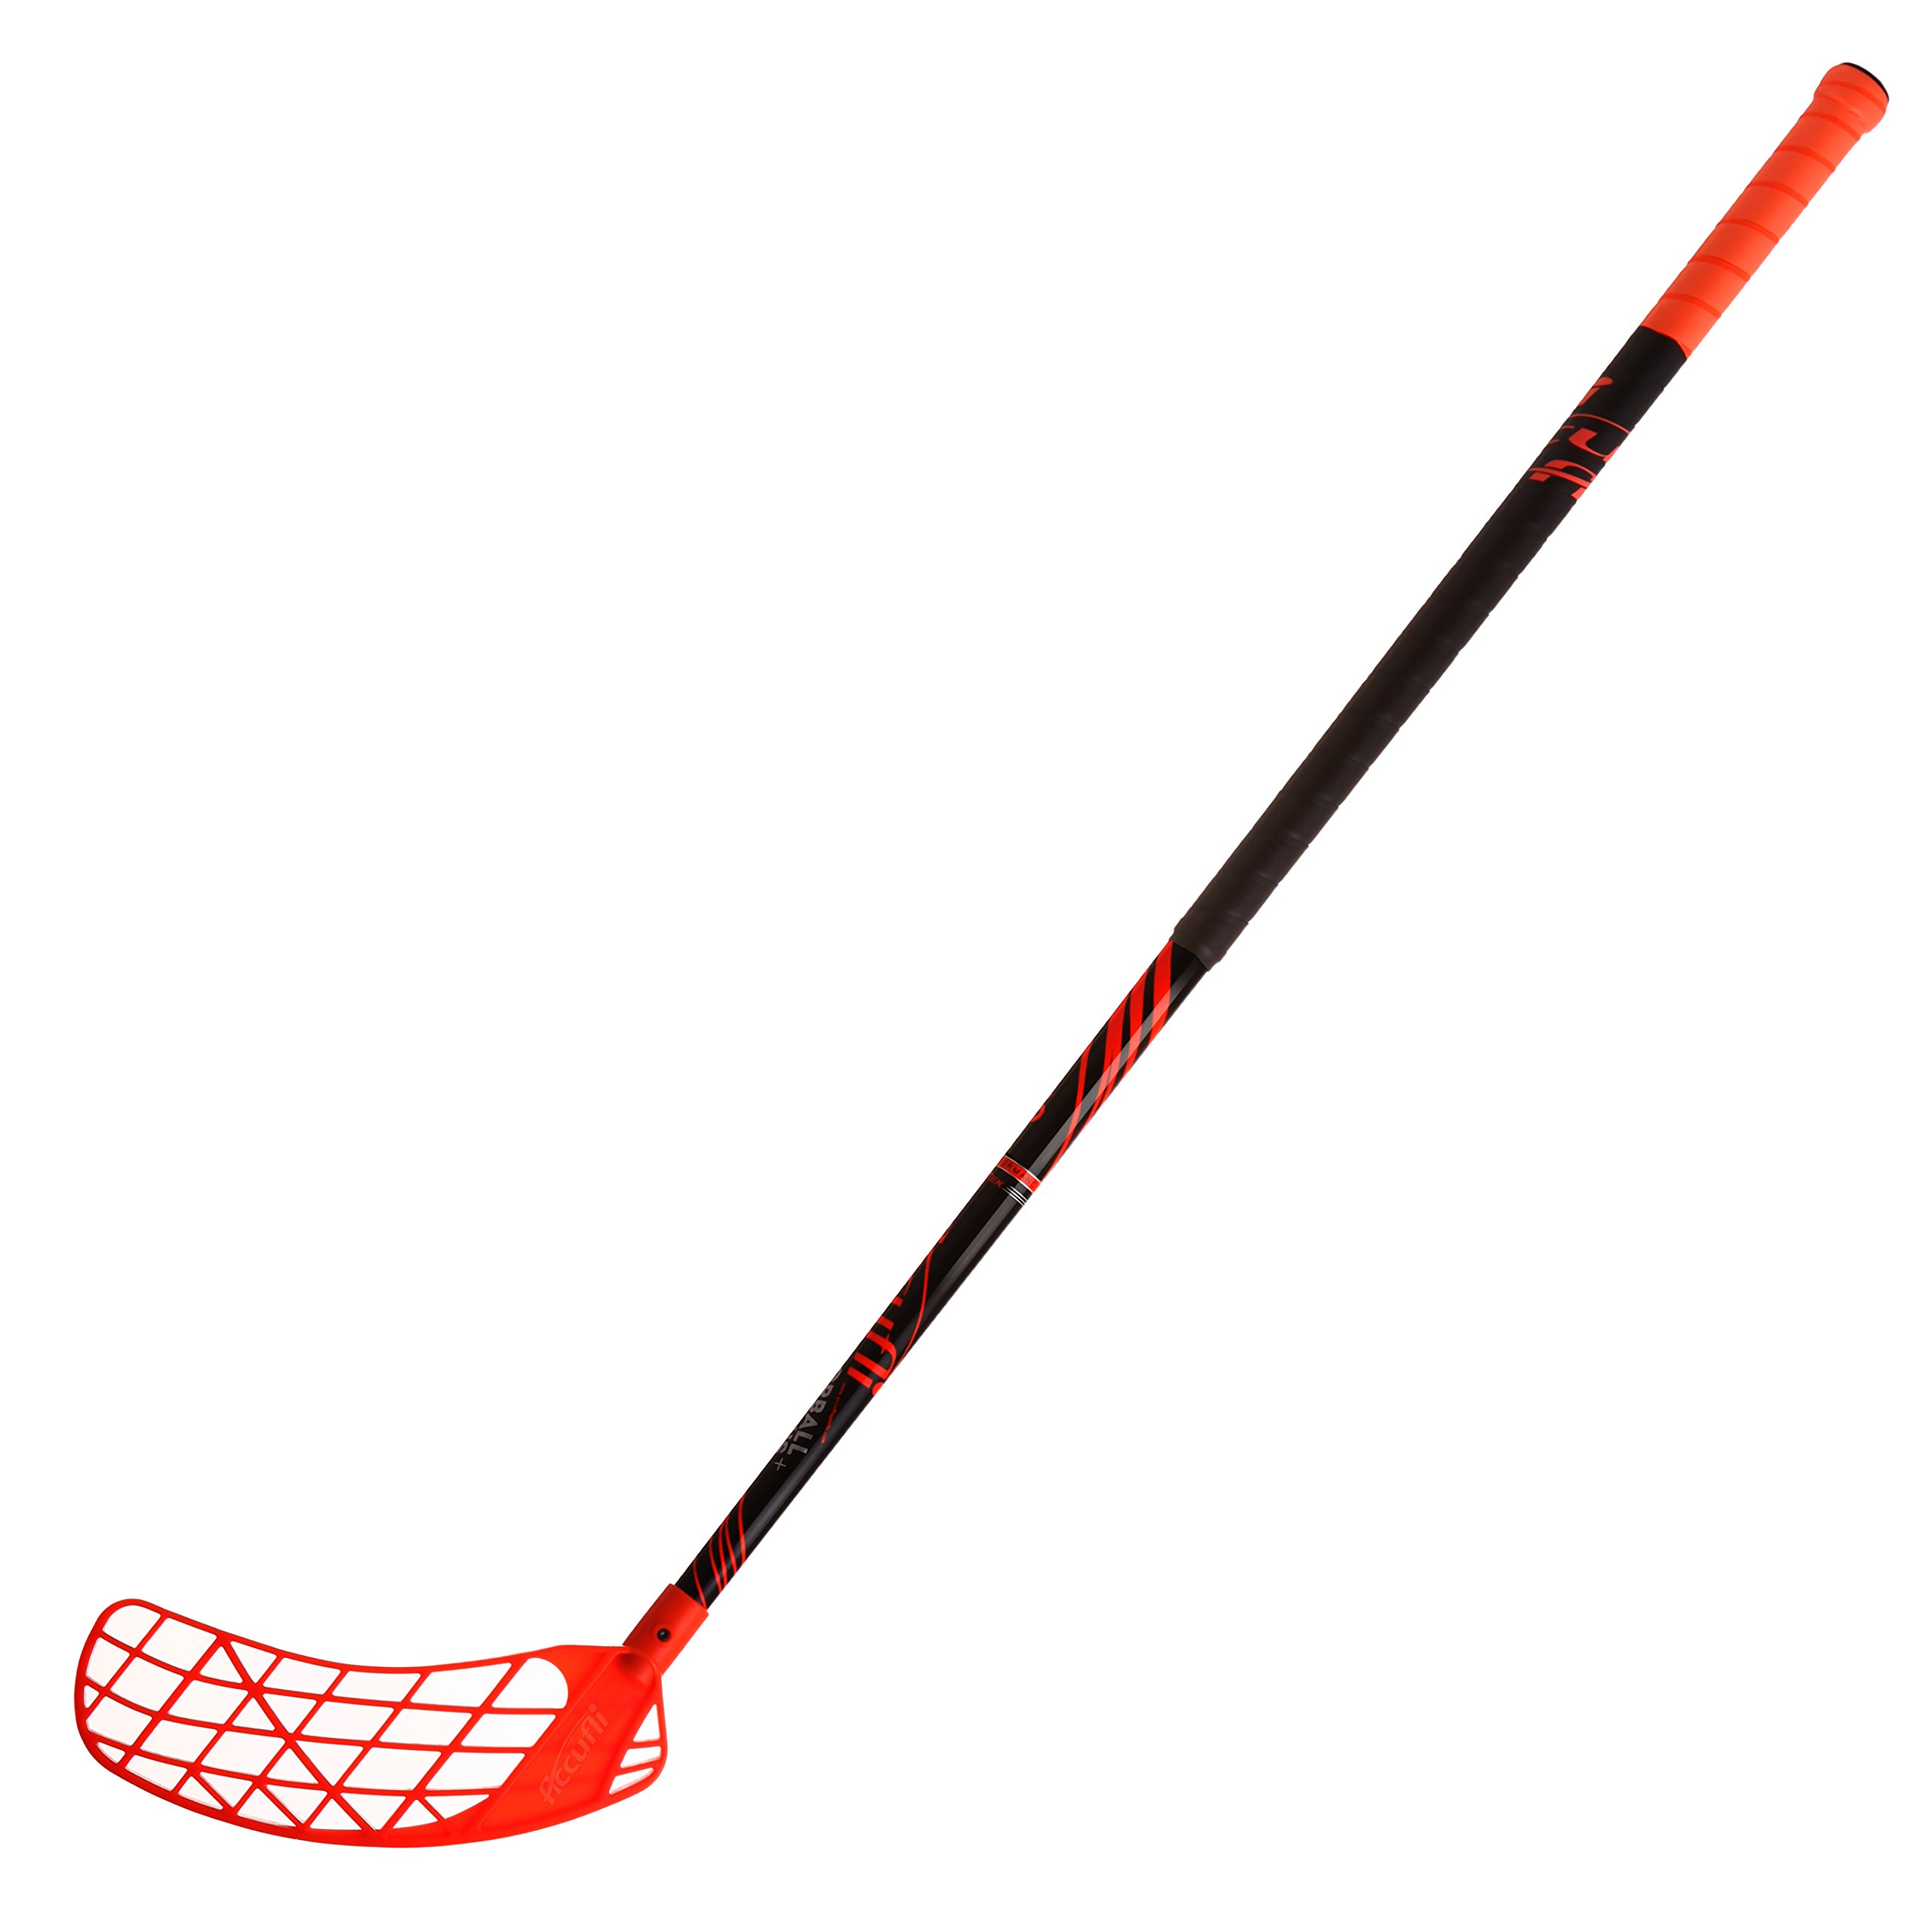 ACCUFLI Floorball Stick AirTek A90 Left 40inch Curved Blade (Orange)